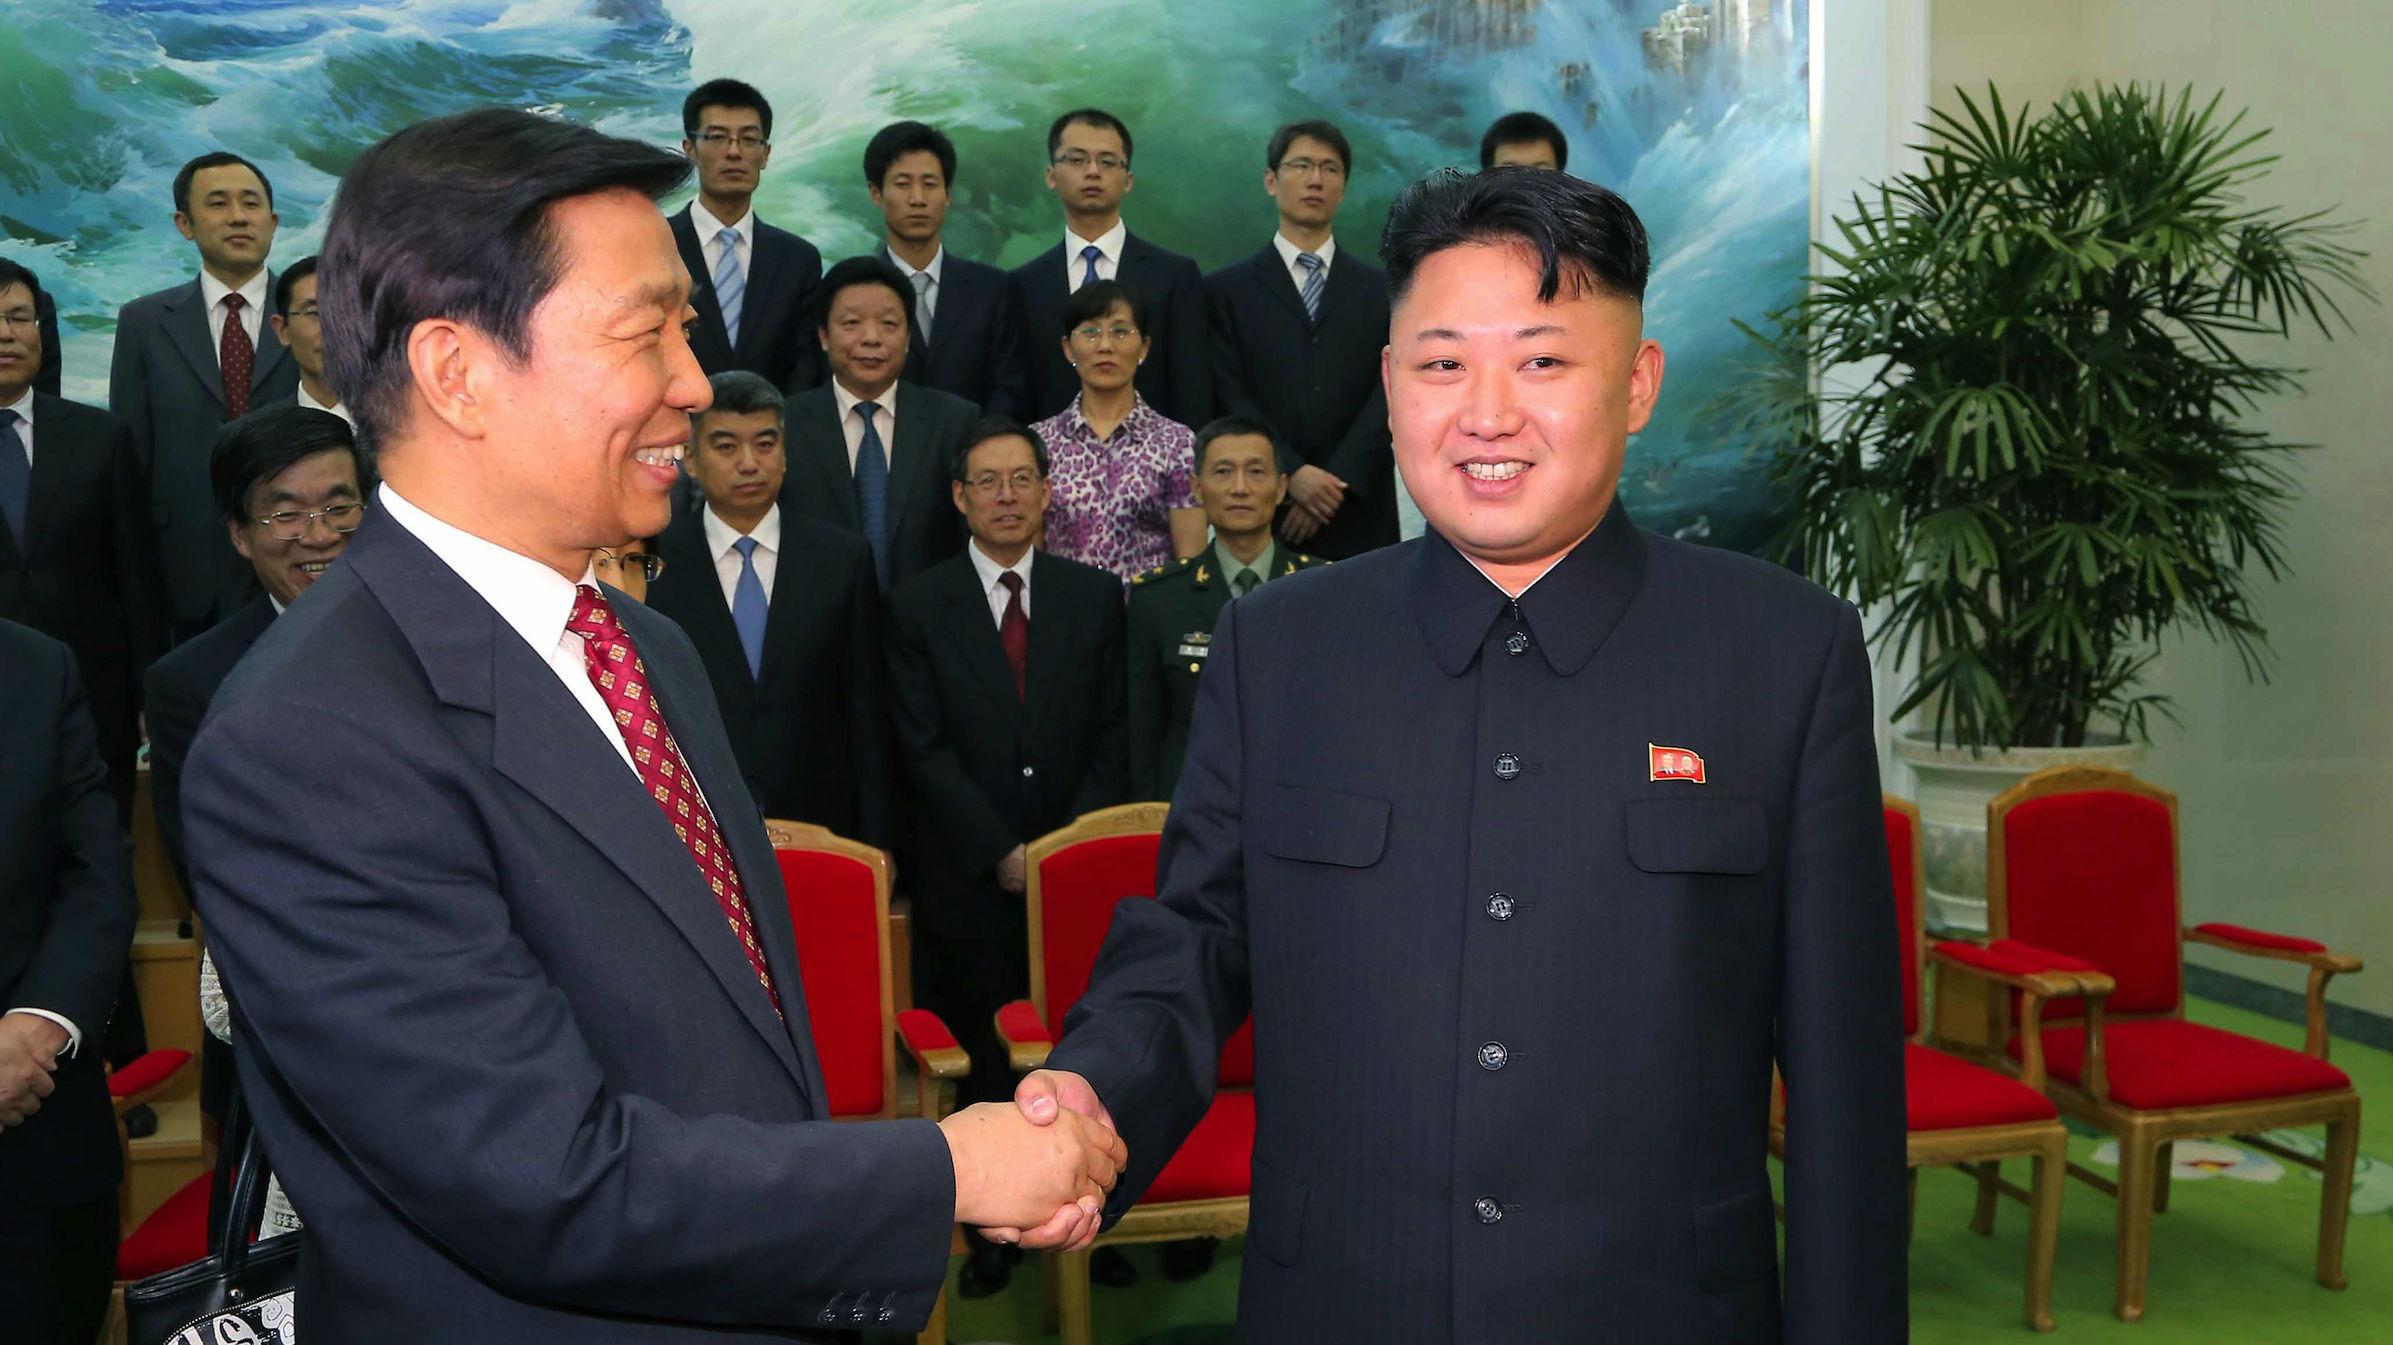 Chinese Vice President Li Yuanchao meets Kim Jong-un